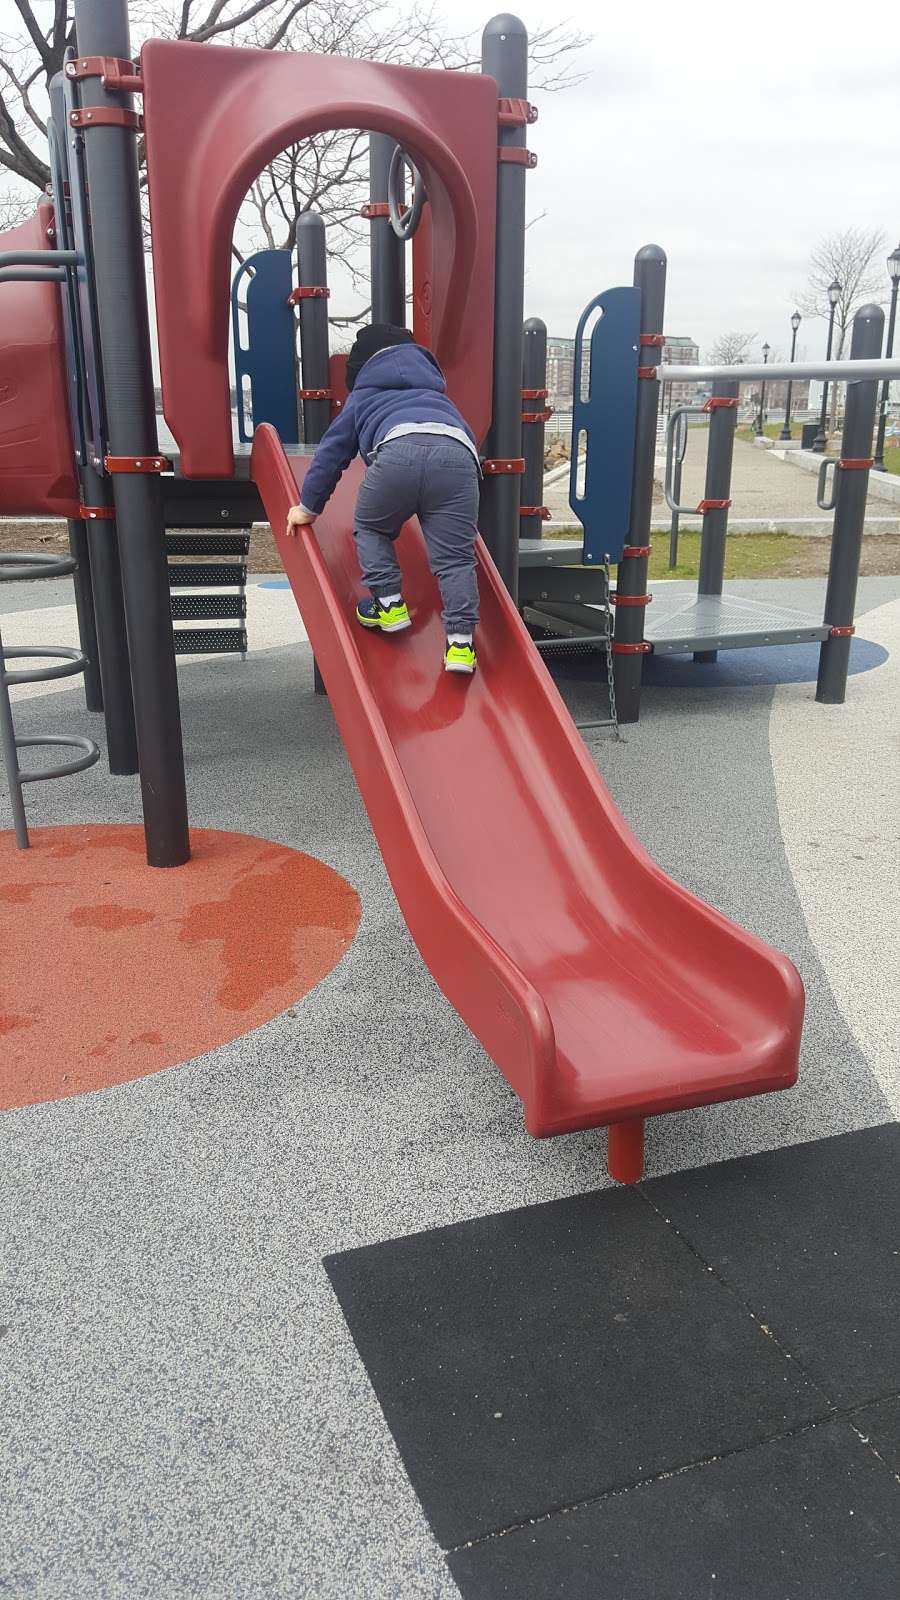 LoPresti Park - park  | Photo 6 of 10 | Address: 33 Sumner St, Boston, MA 02128, USA | Phone: (617) 635-4505